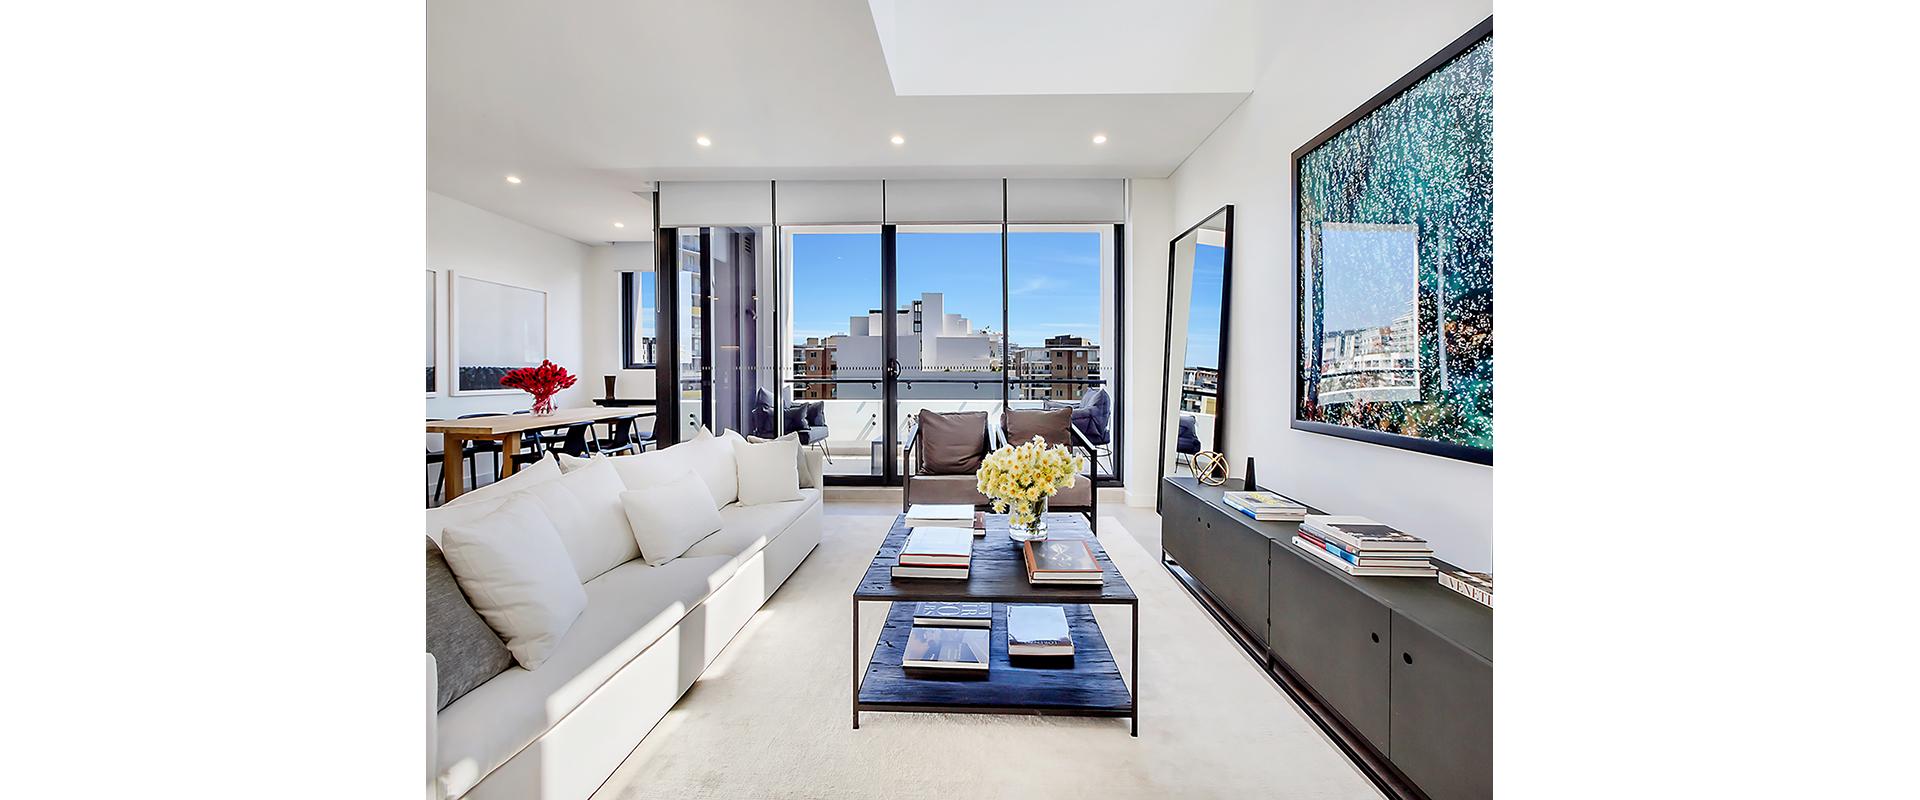 Apartments for Rent in Mascot | Escada | Meriton